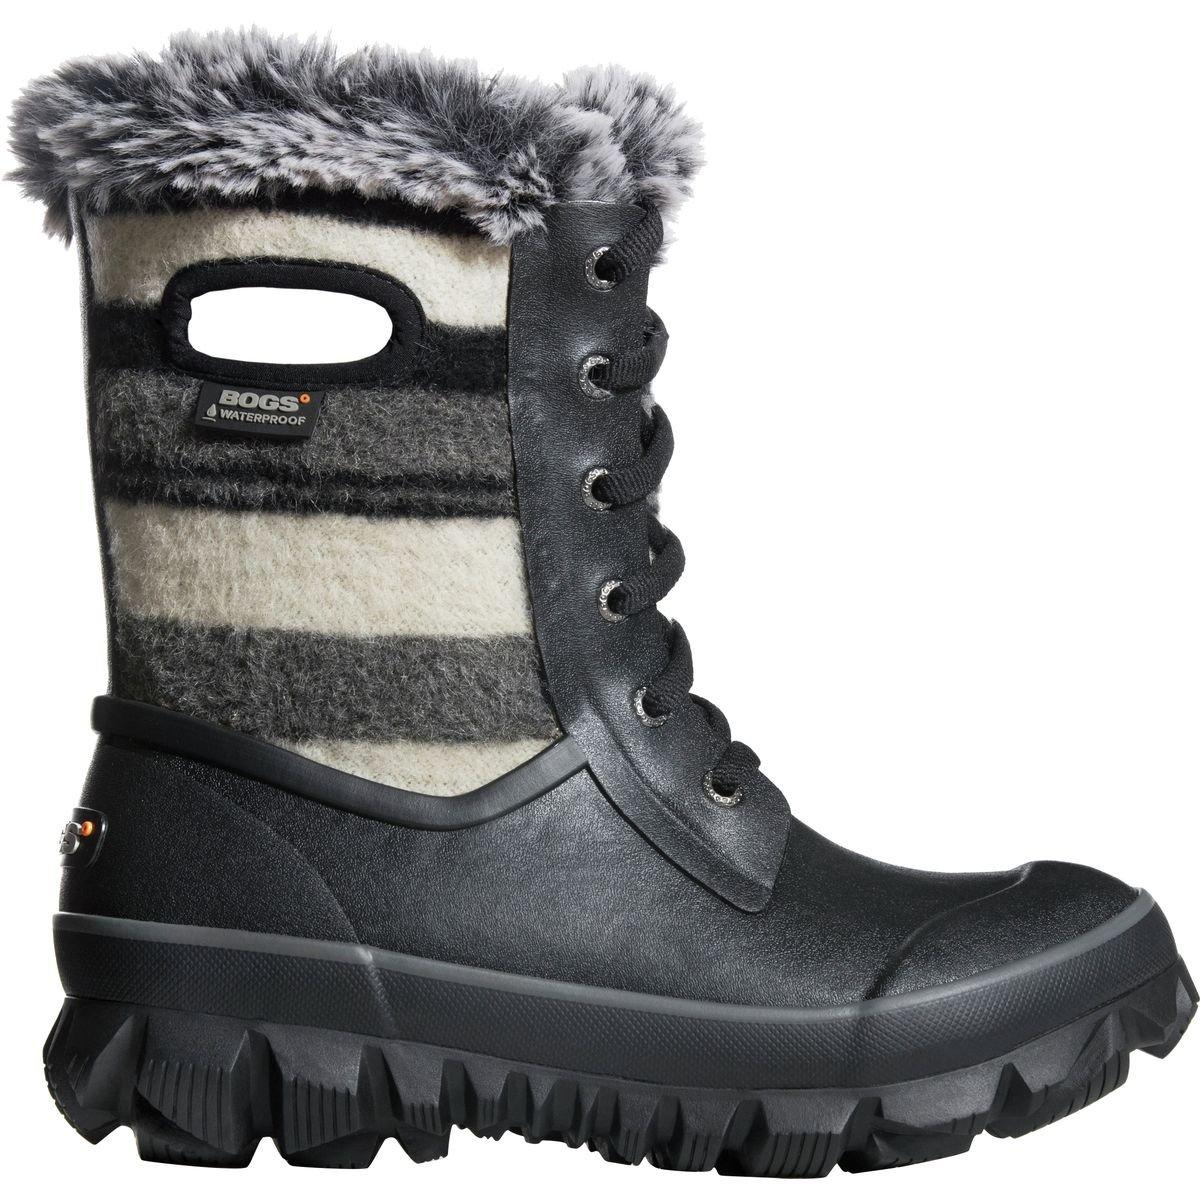 Bogs Womens Arcata Sripe Snow Boot Black Multi Size 11